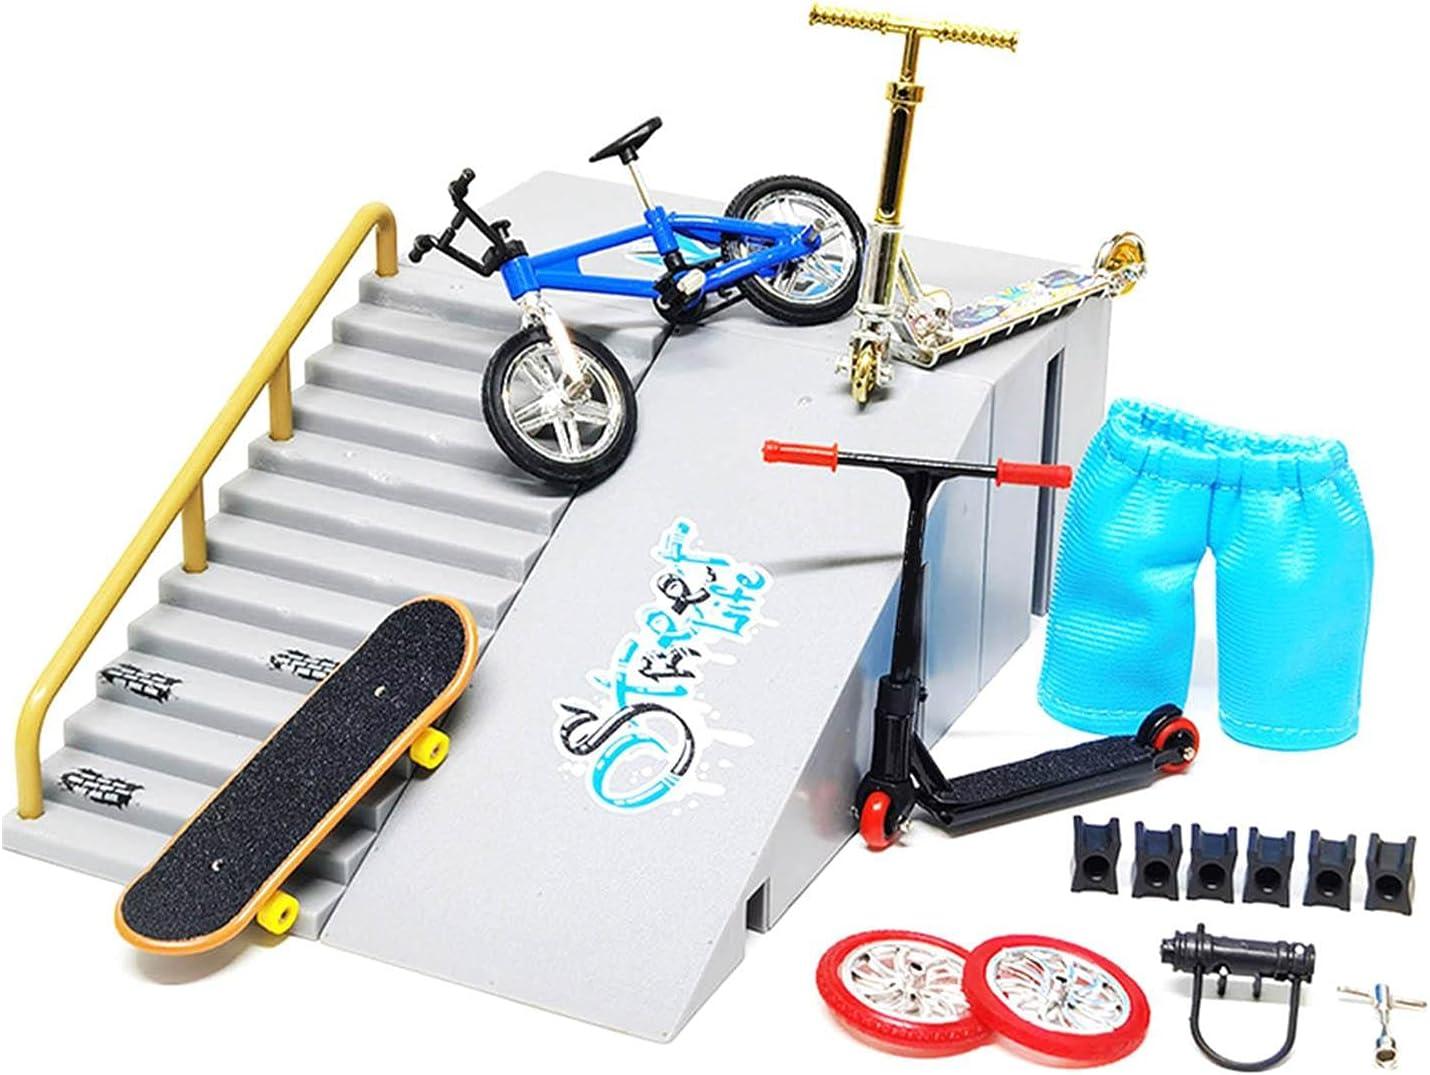 bluesa Finger Scooter De Dedos Juguete De Dedo, Mini Finger Scooter Rampa Tech - Deck Patineta De Dedos, Tabla Scooter para Los Dedos Casa Mini Skateboard Juguete Conjunto, Bicicleta De Dedo Azul 1